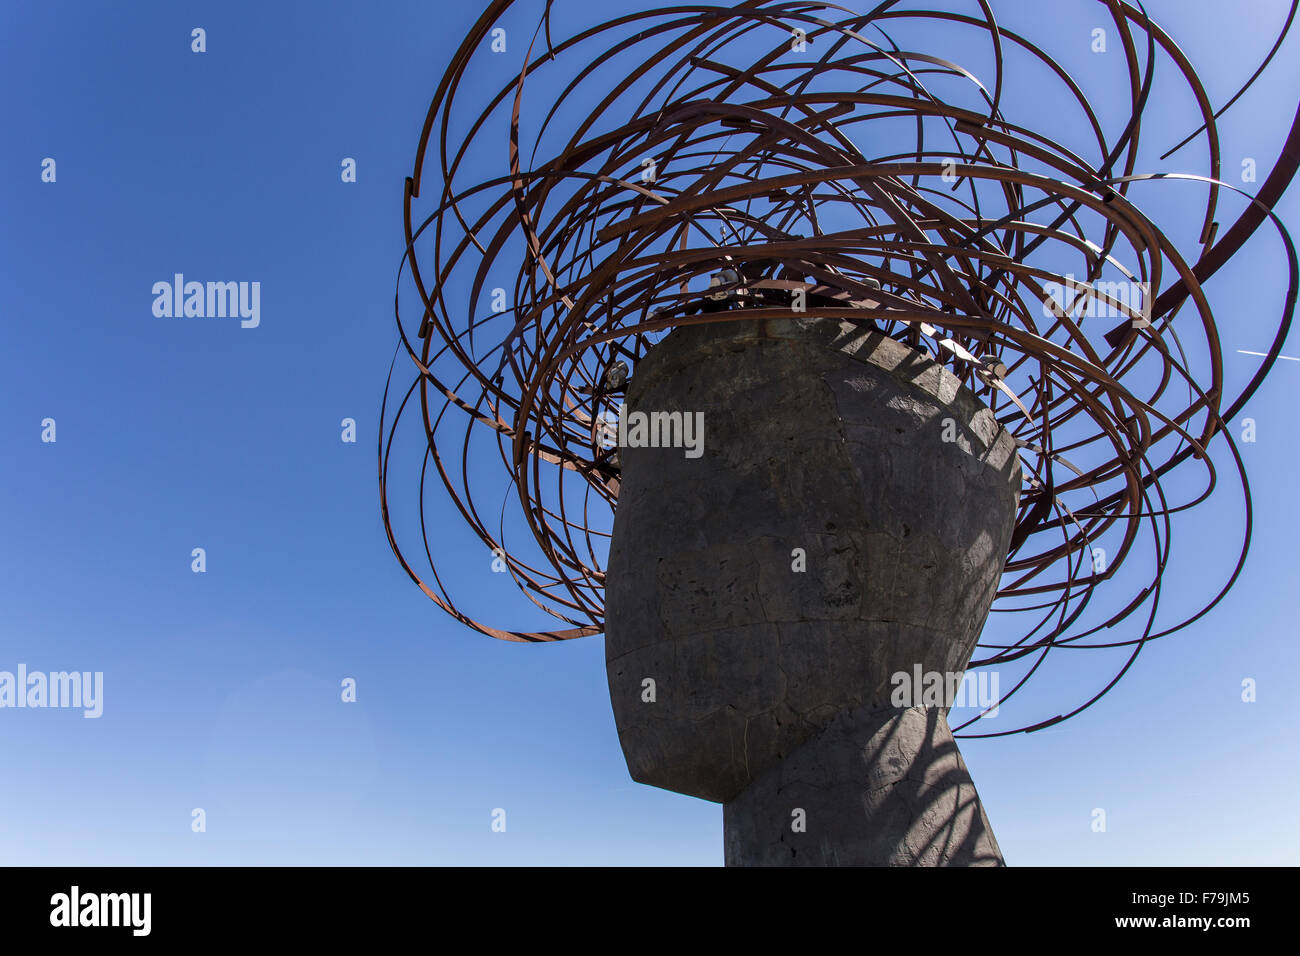 sculpture of the head of Ariadne in the Manzanares Park Stock Photo